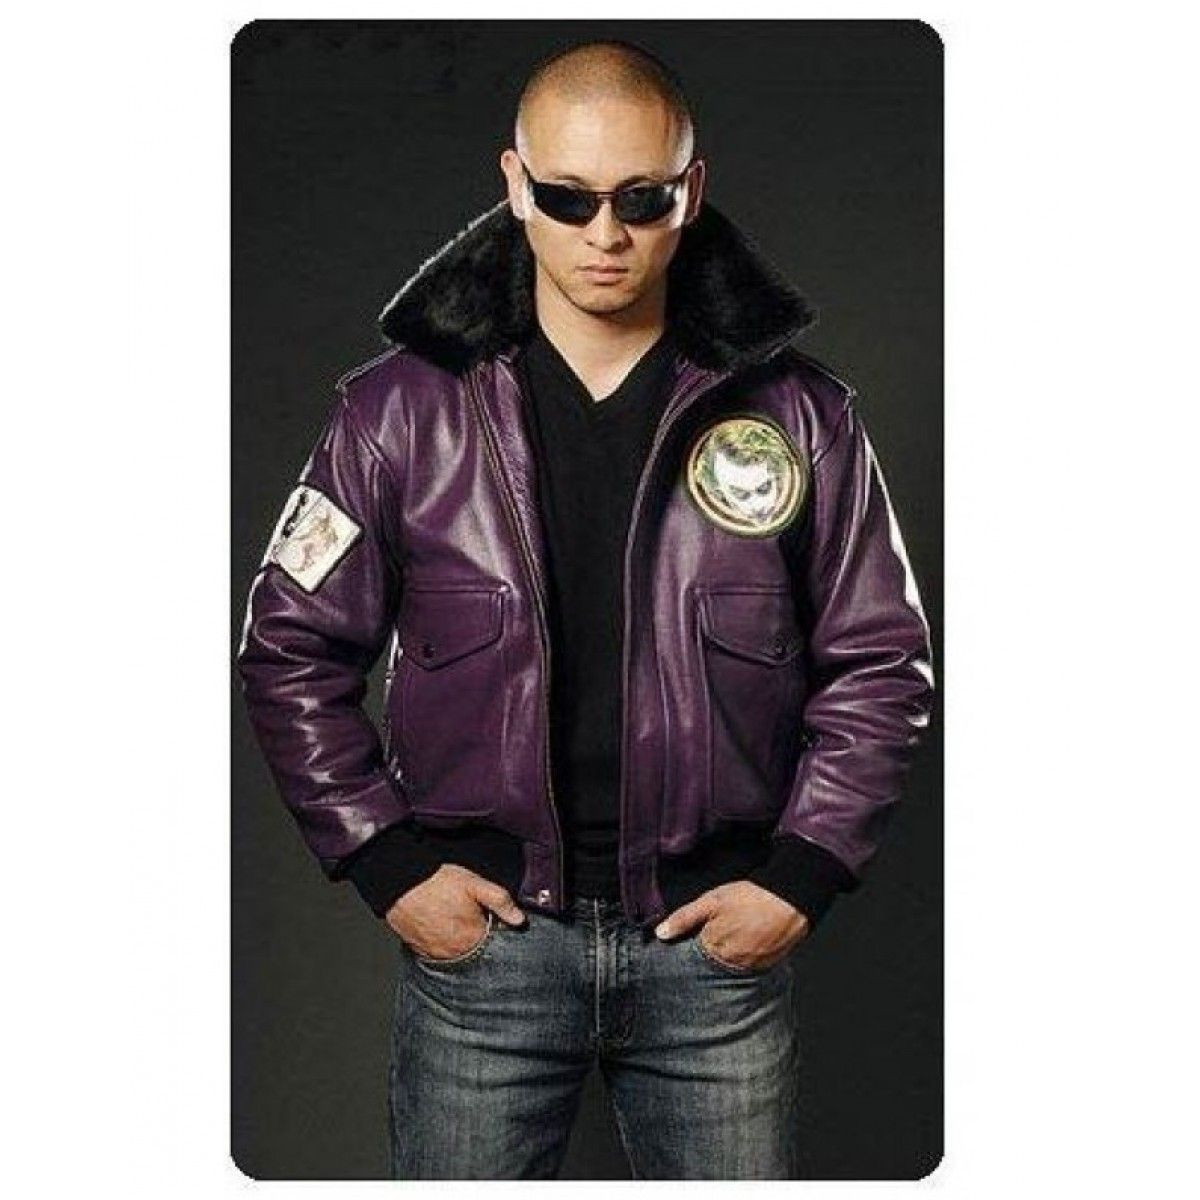 Leather jacket yellow stripe - Batman Motorcycle Yellow Stripes Costume Leather Jacket